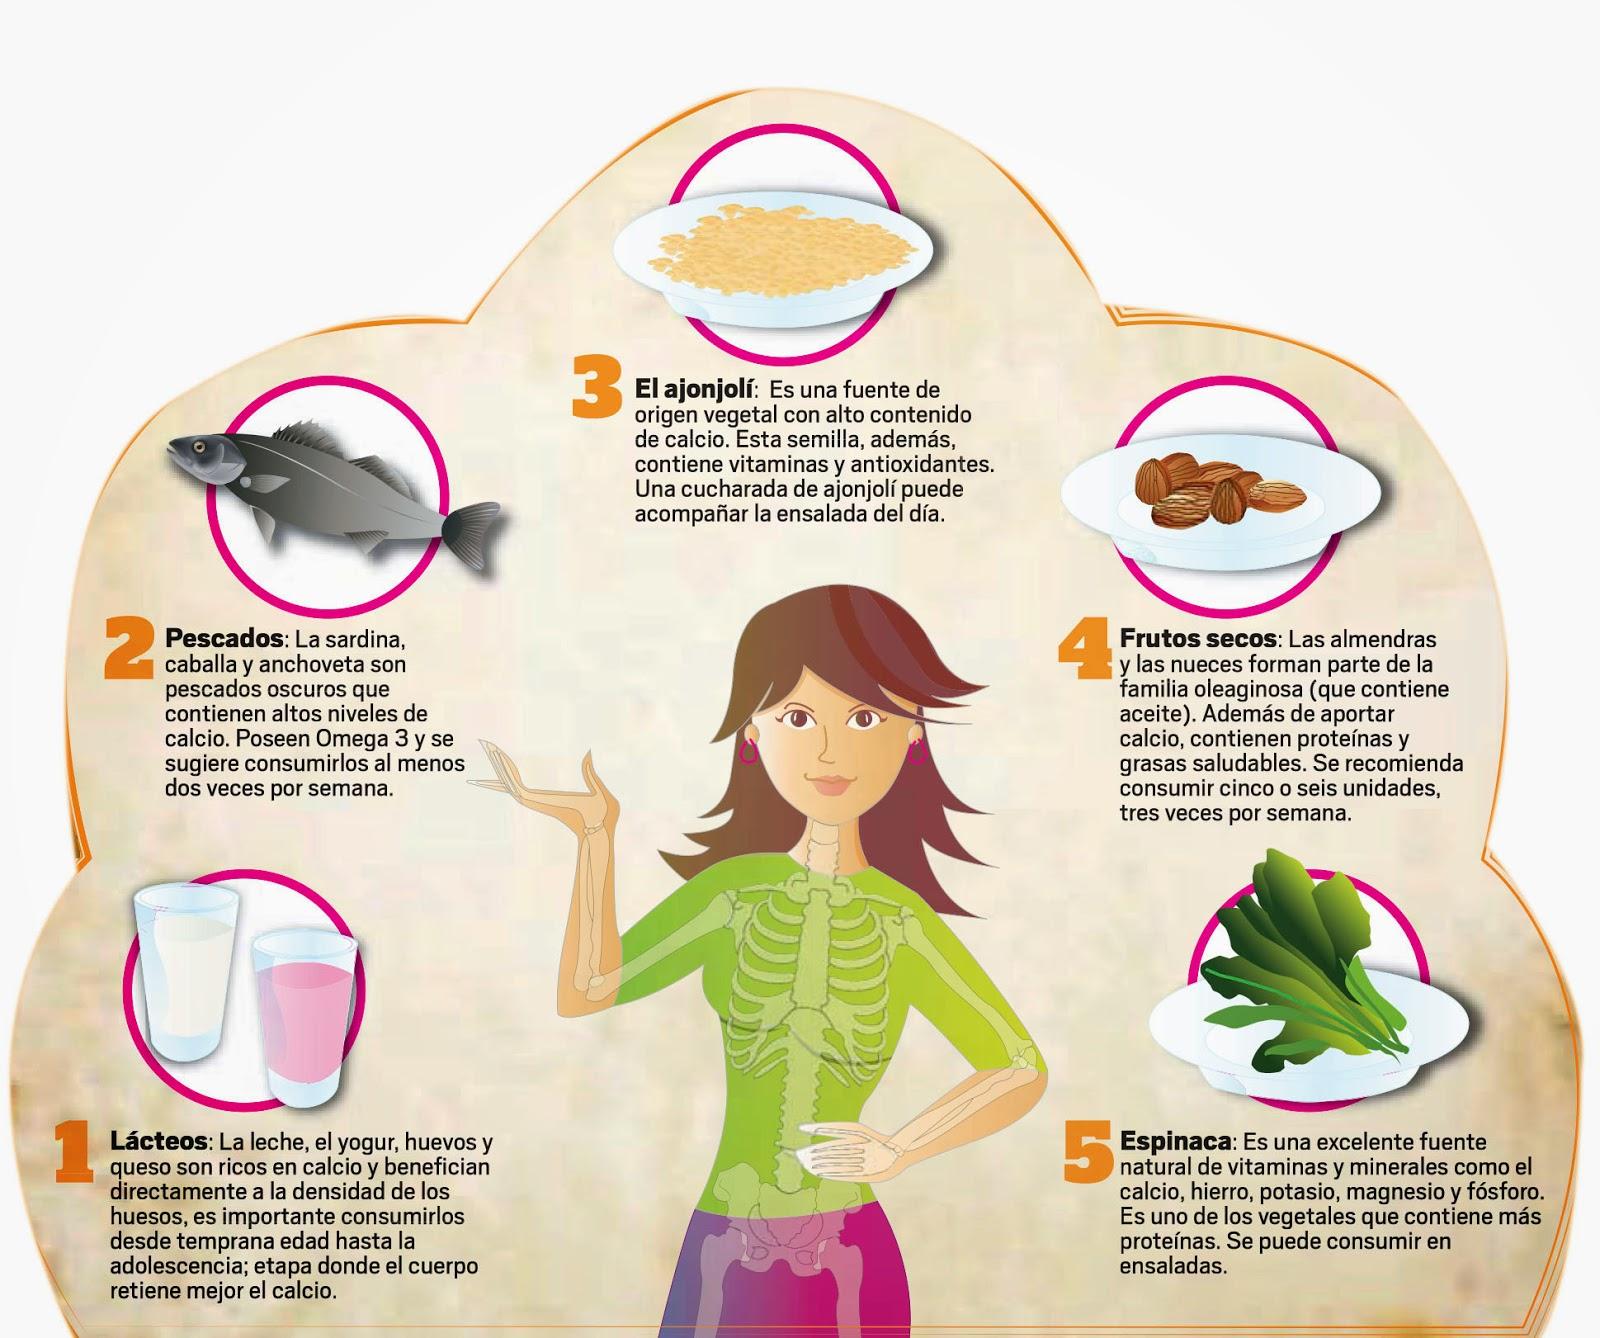 Cinco alimentos contra la osteoporosis infograf as del per freelance en dise o editorial - Alimentos para la osteoporosis ...